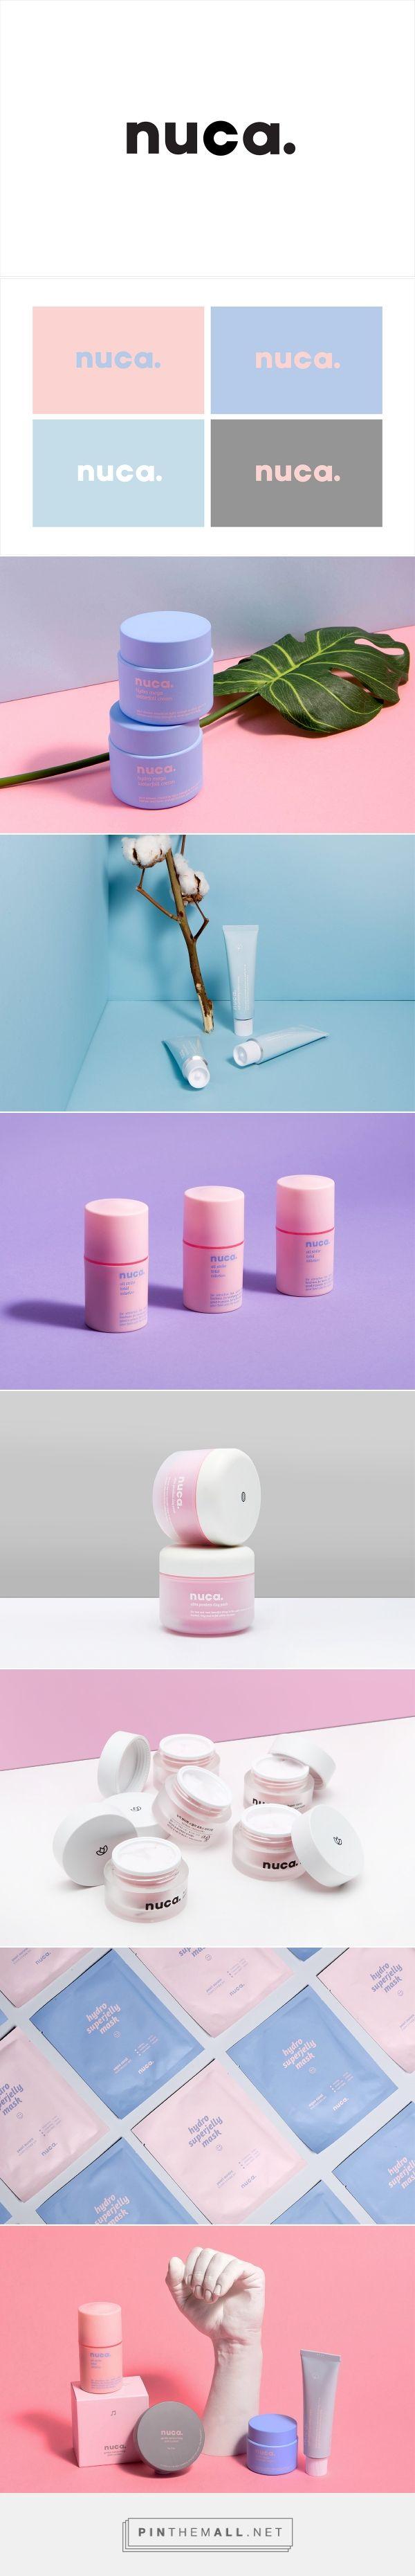 nuca Brand Design on Behance - created via https://pinthemall.net